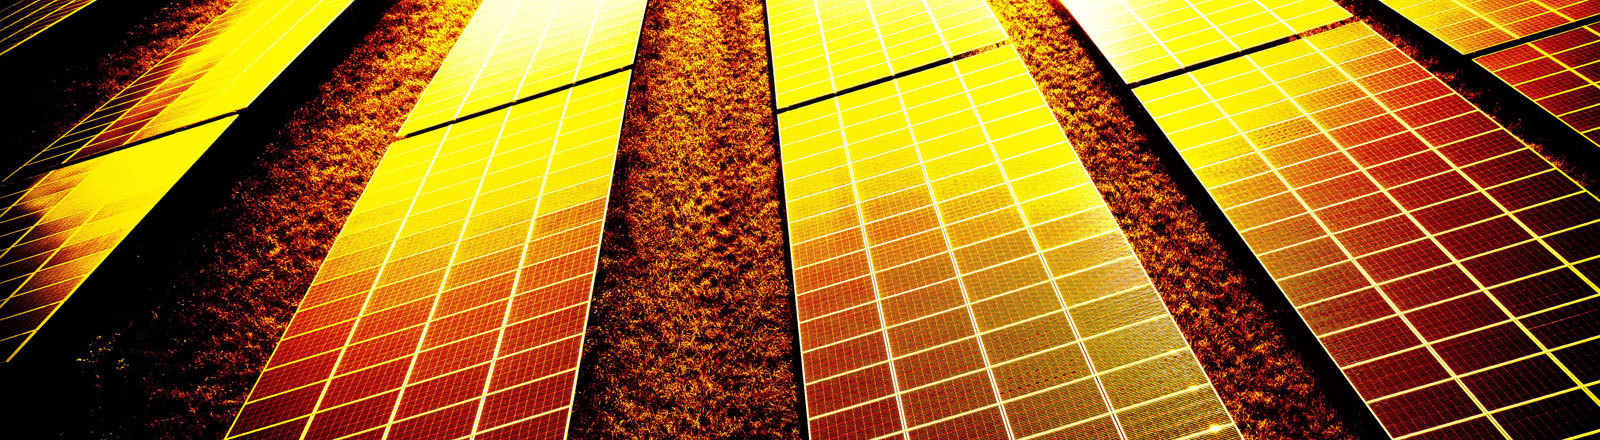 Photovoltaikanlage bei Sonnenuntergang.